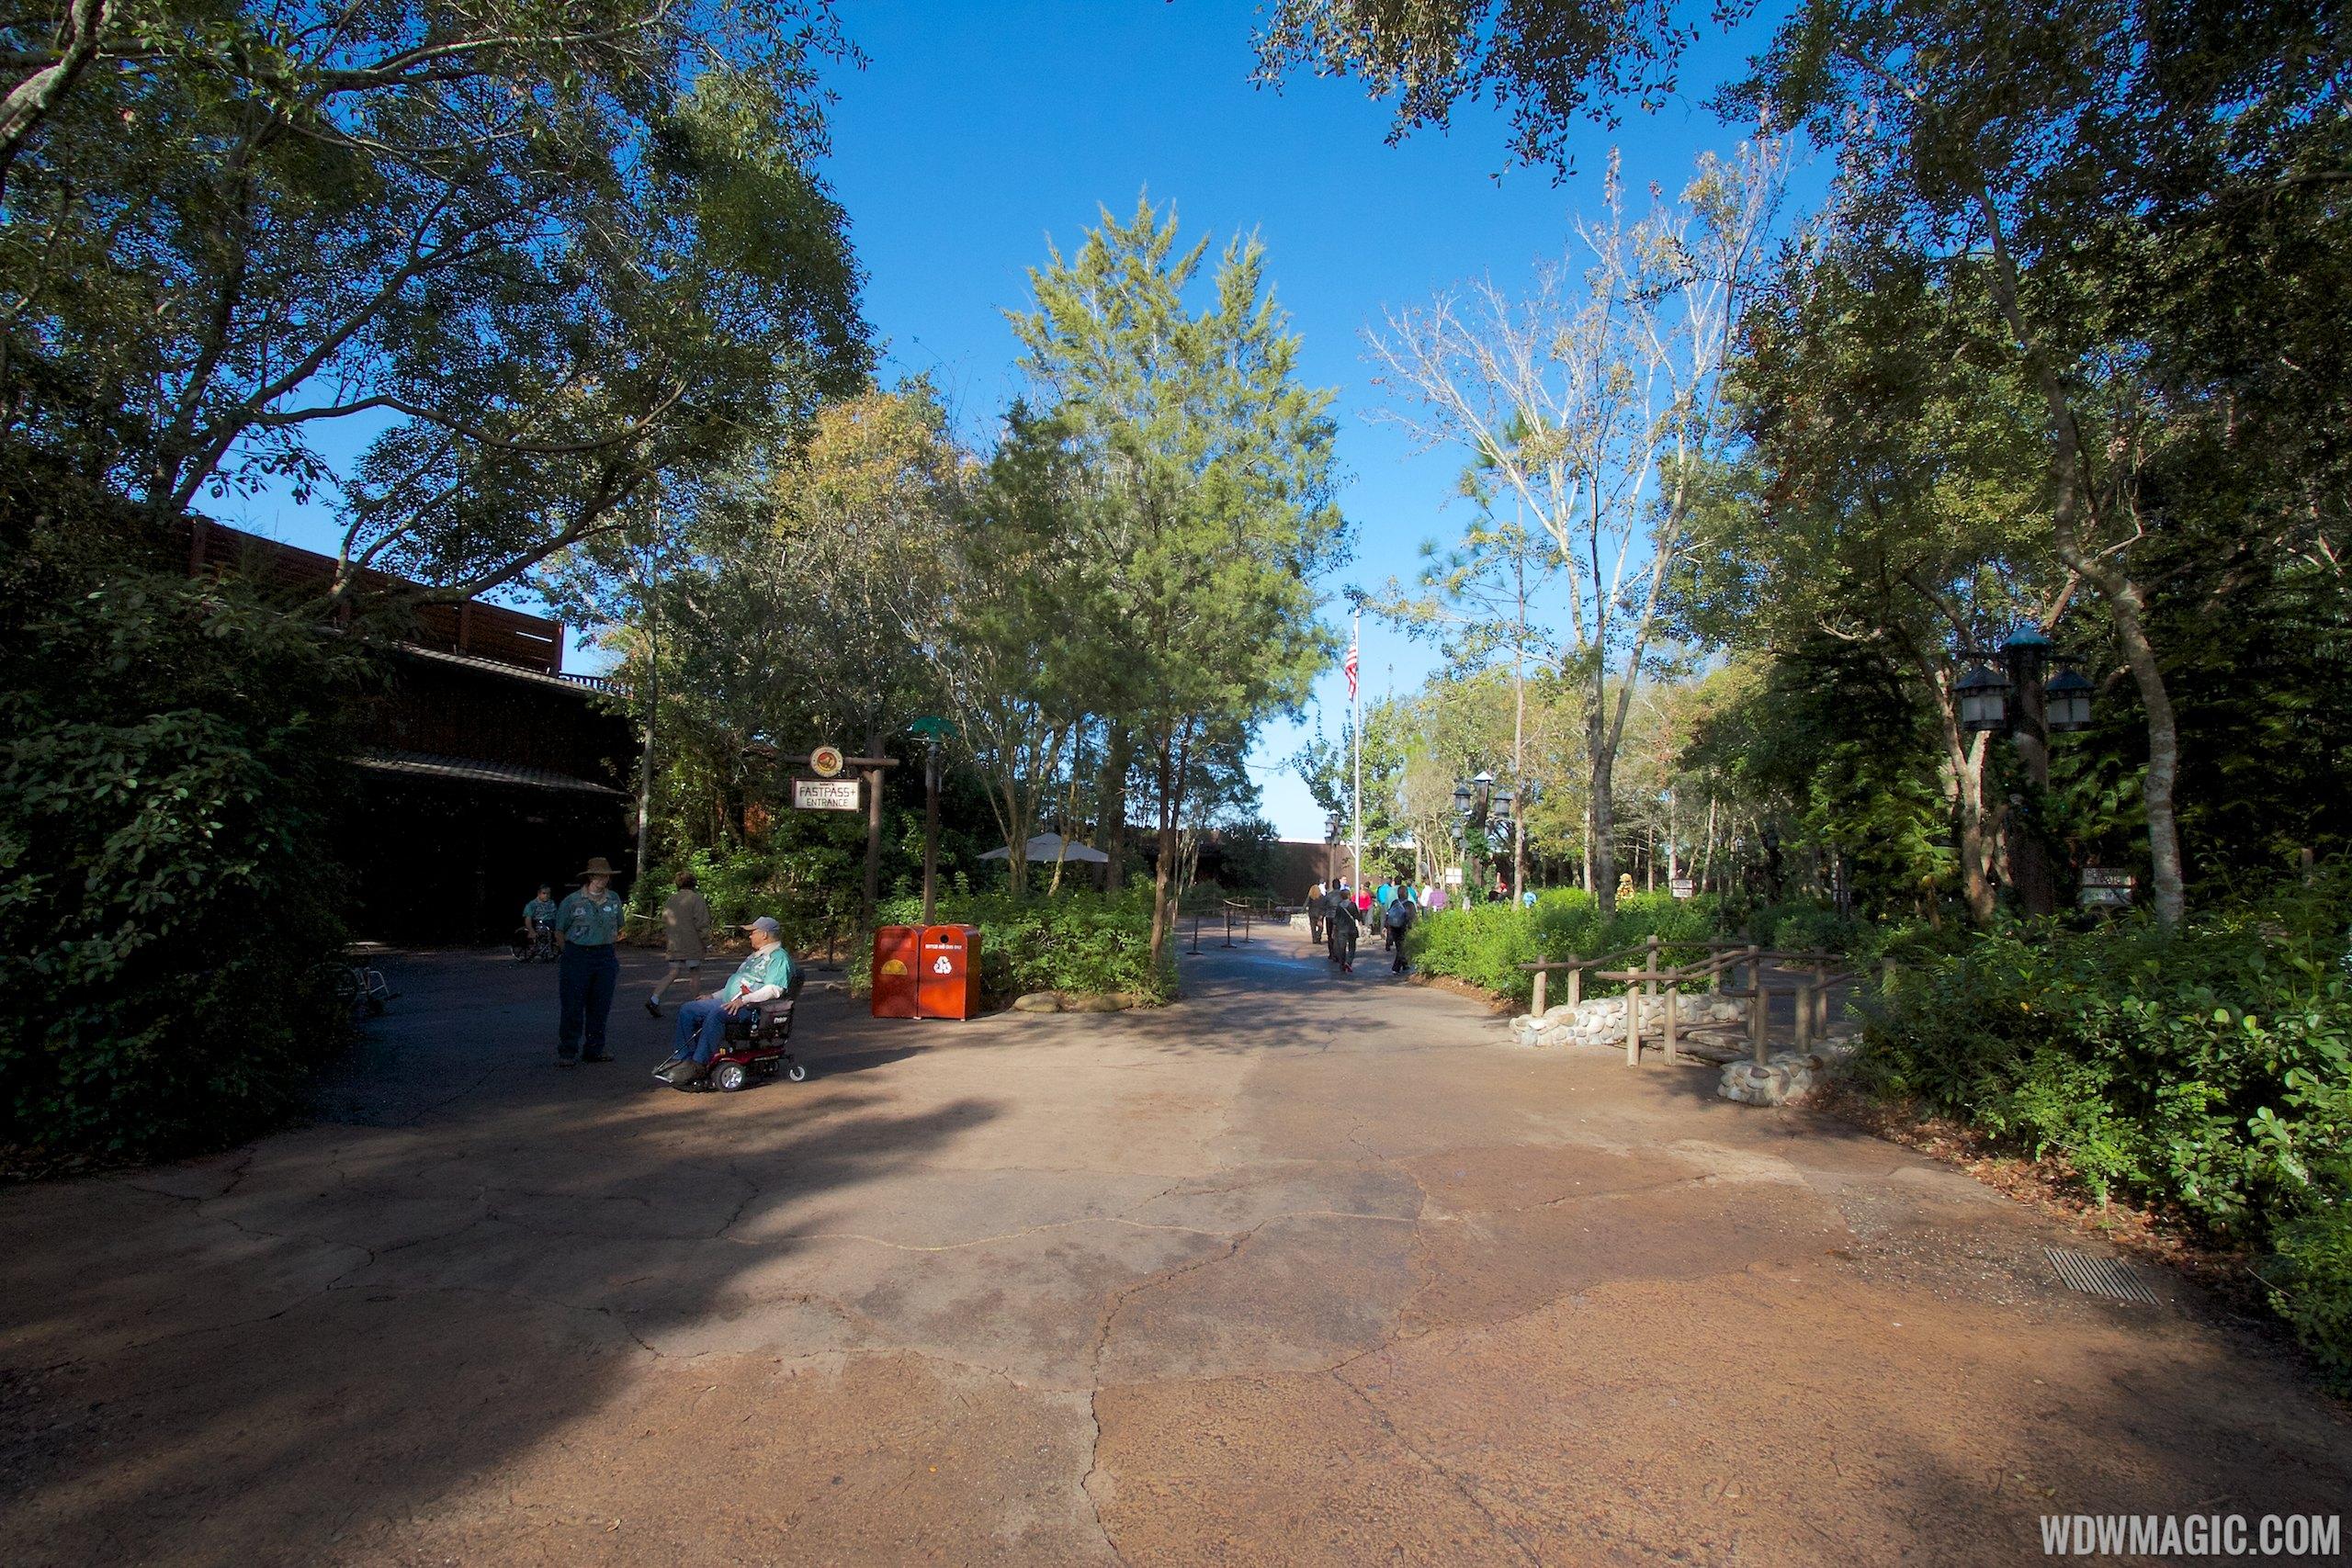 Camp Minnie-Mickey walkthrough on final day of operation